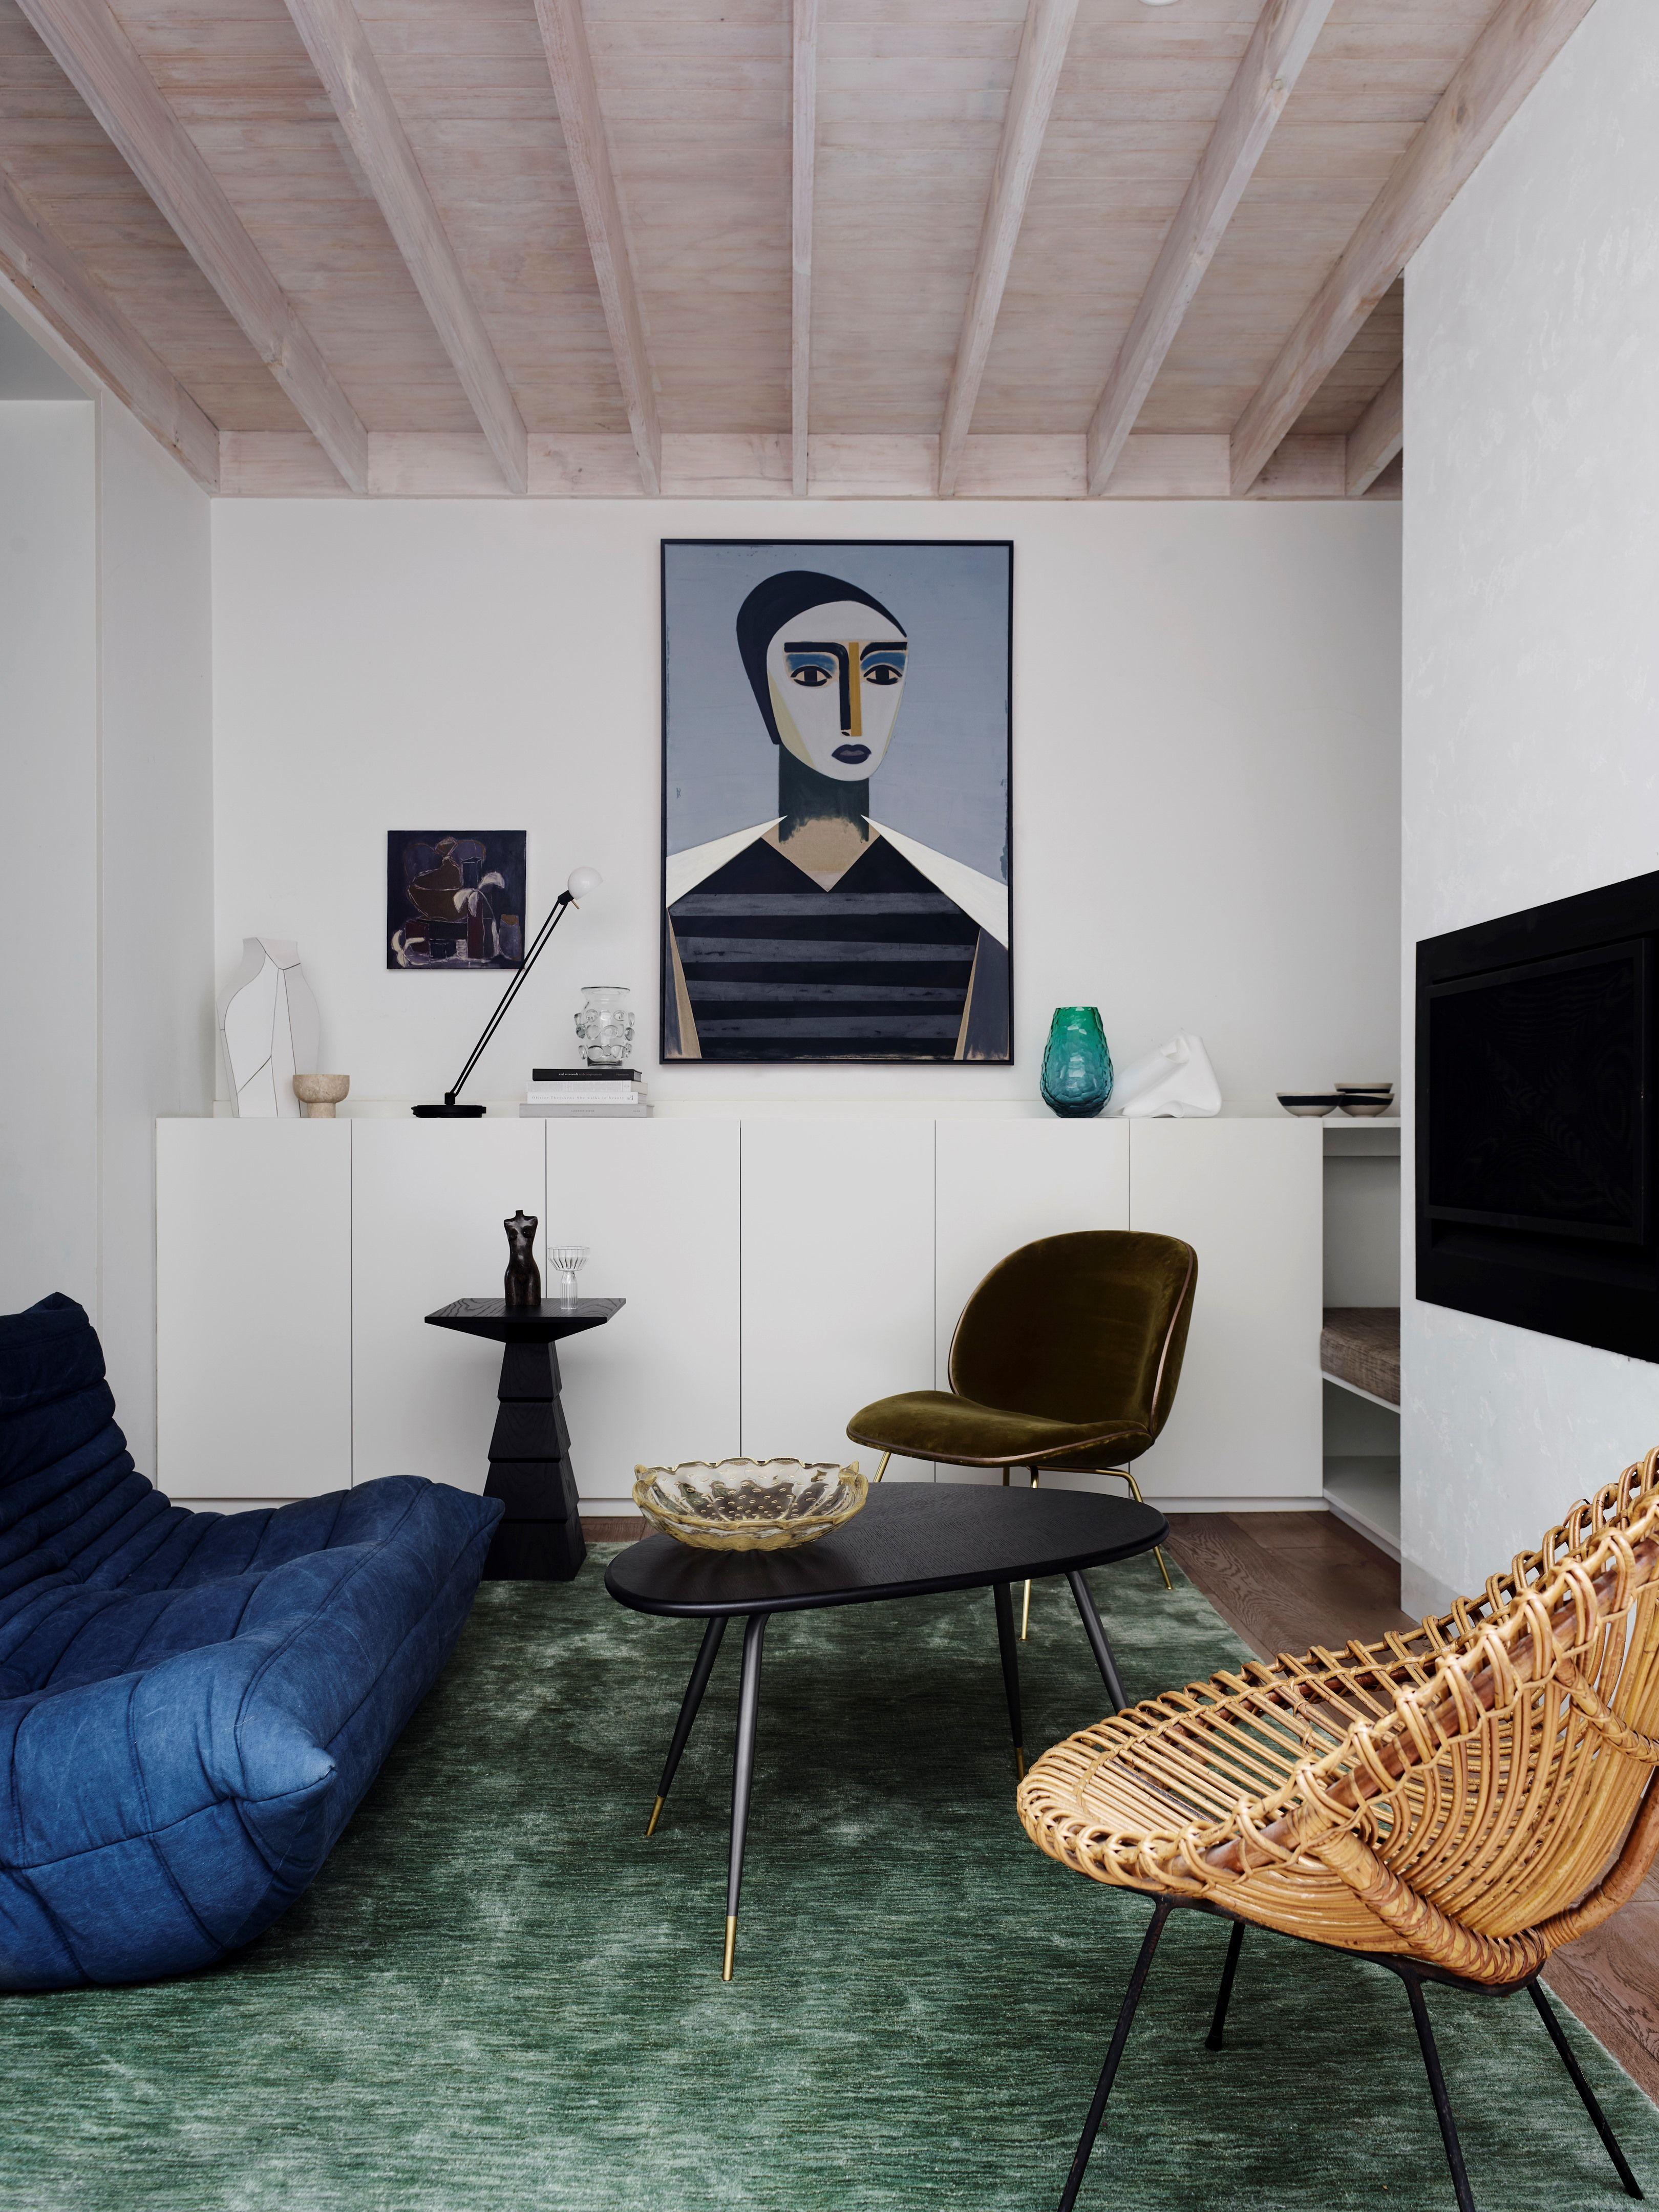 Bondi Junction House Picture Gallery Living Room Interior House Interior Interior Design